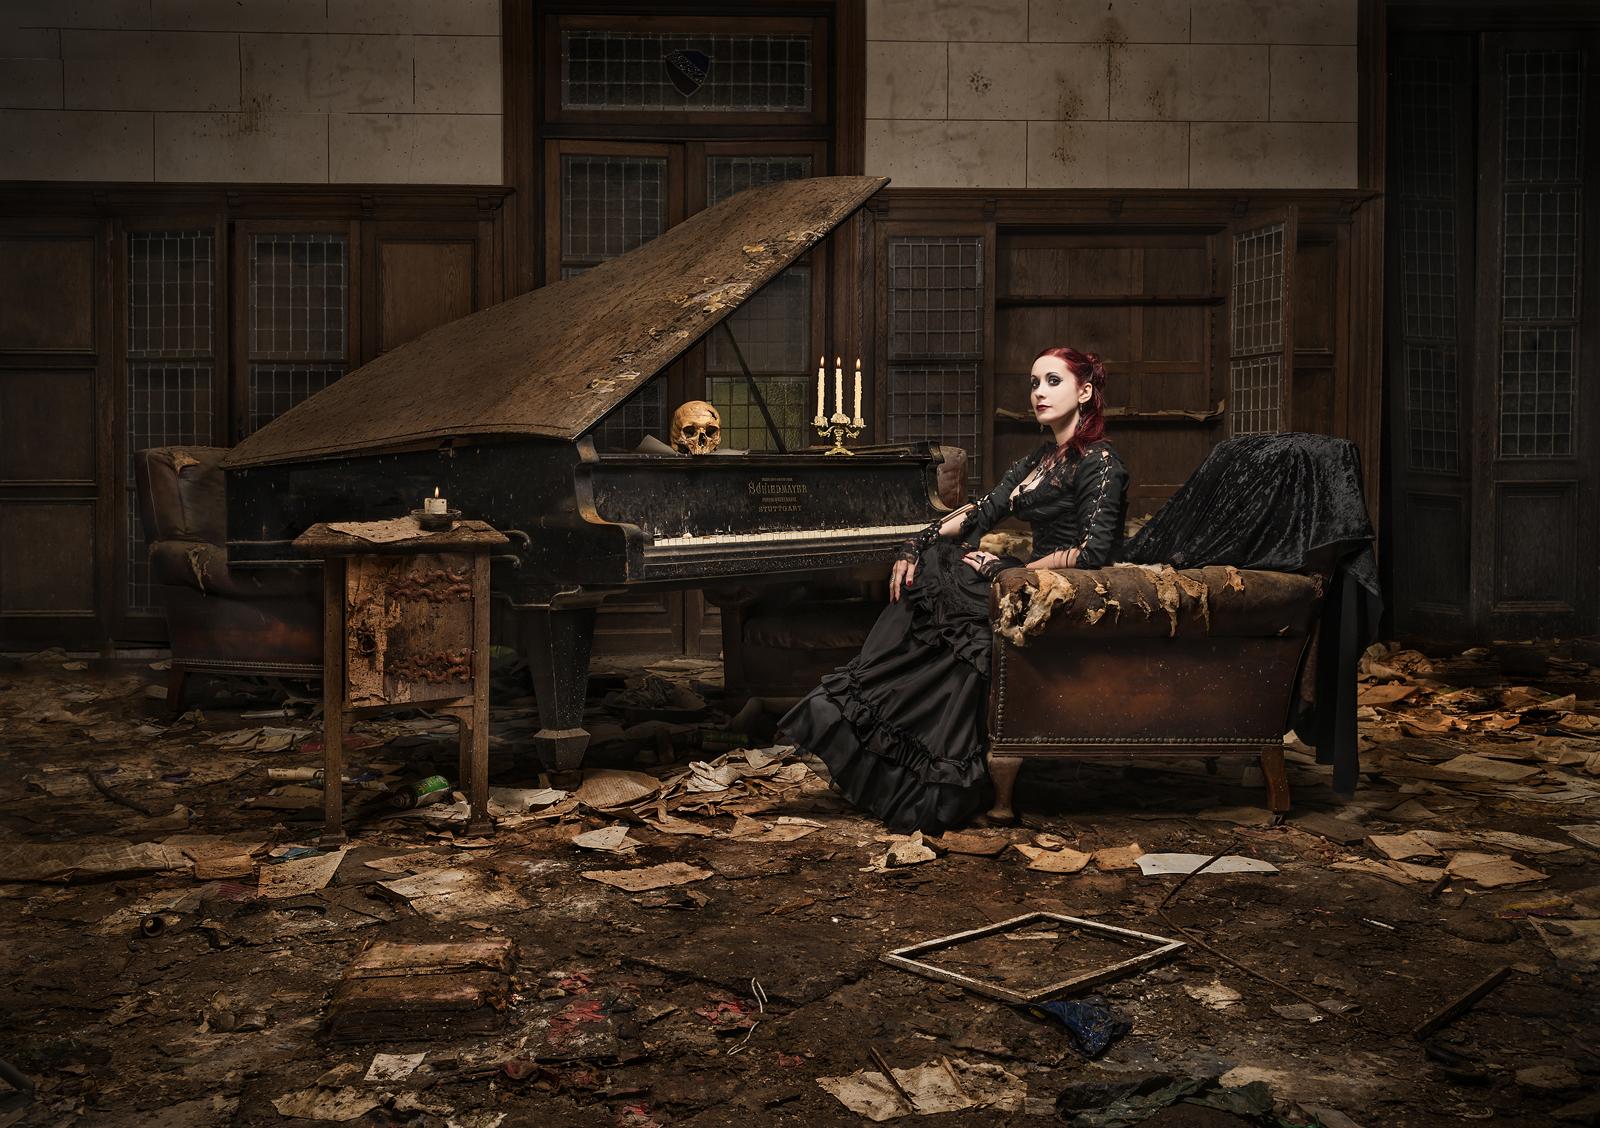 Dama Gótica